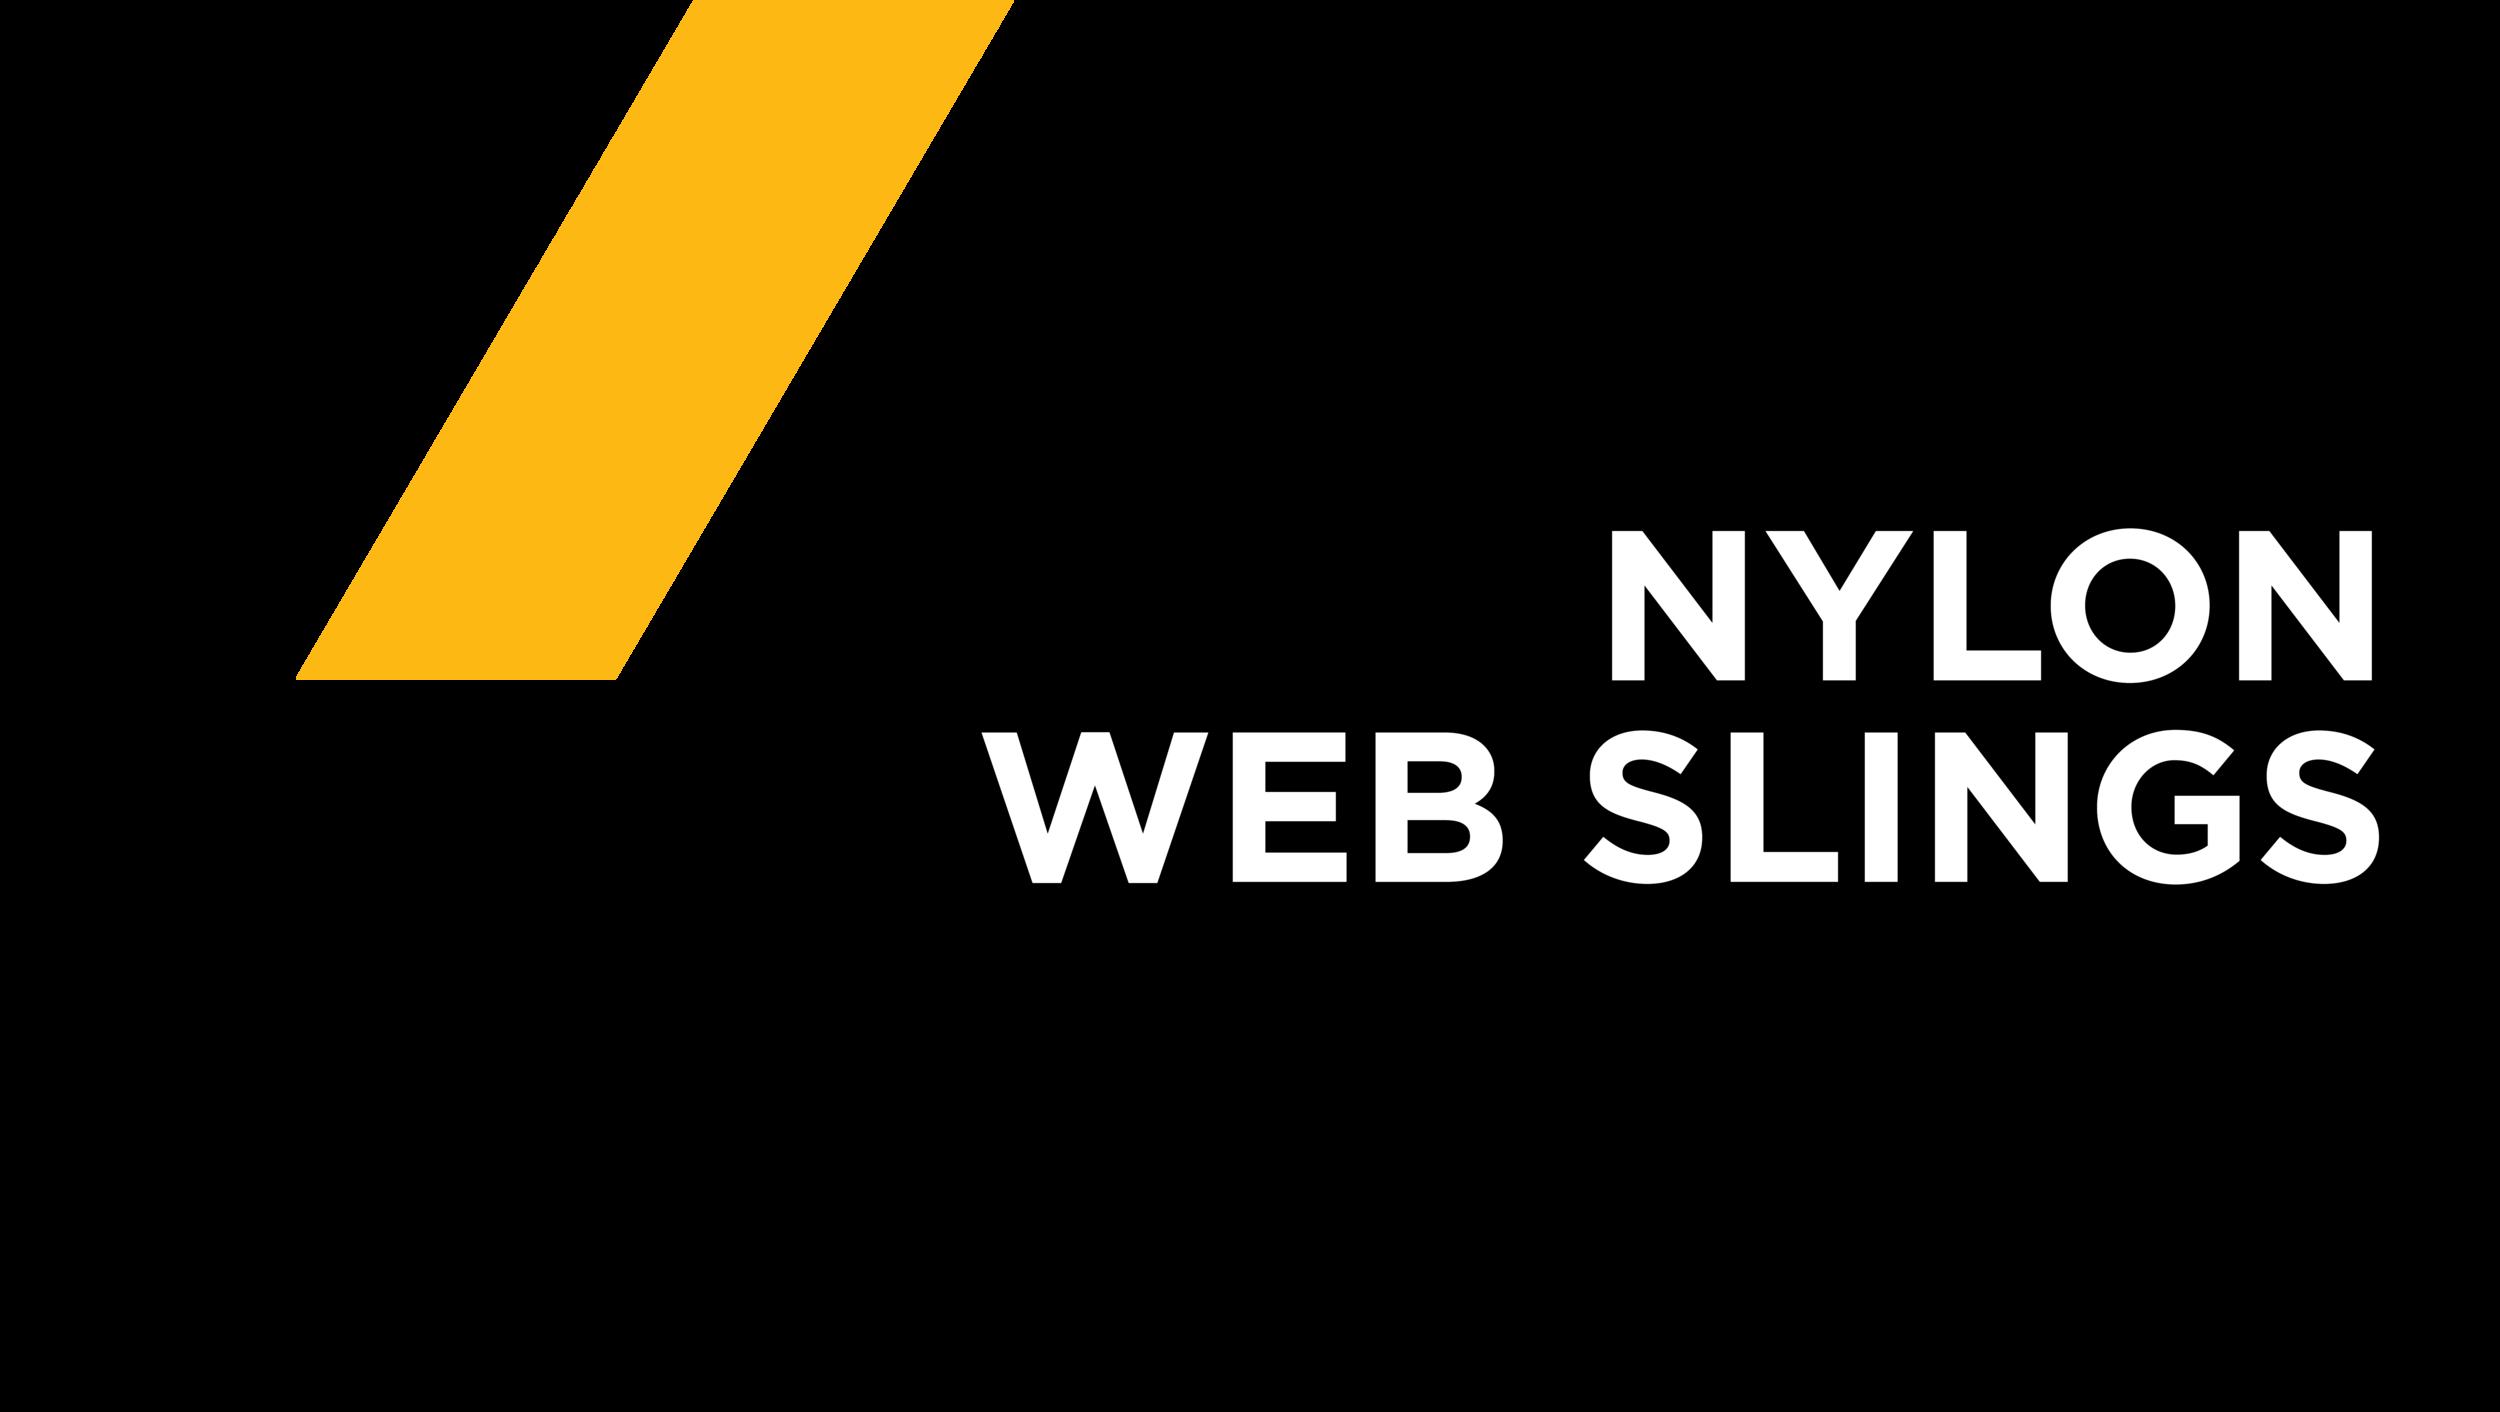 HESCO-Nylon-Web-Slings-button-01.png